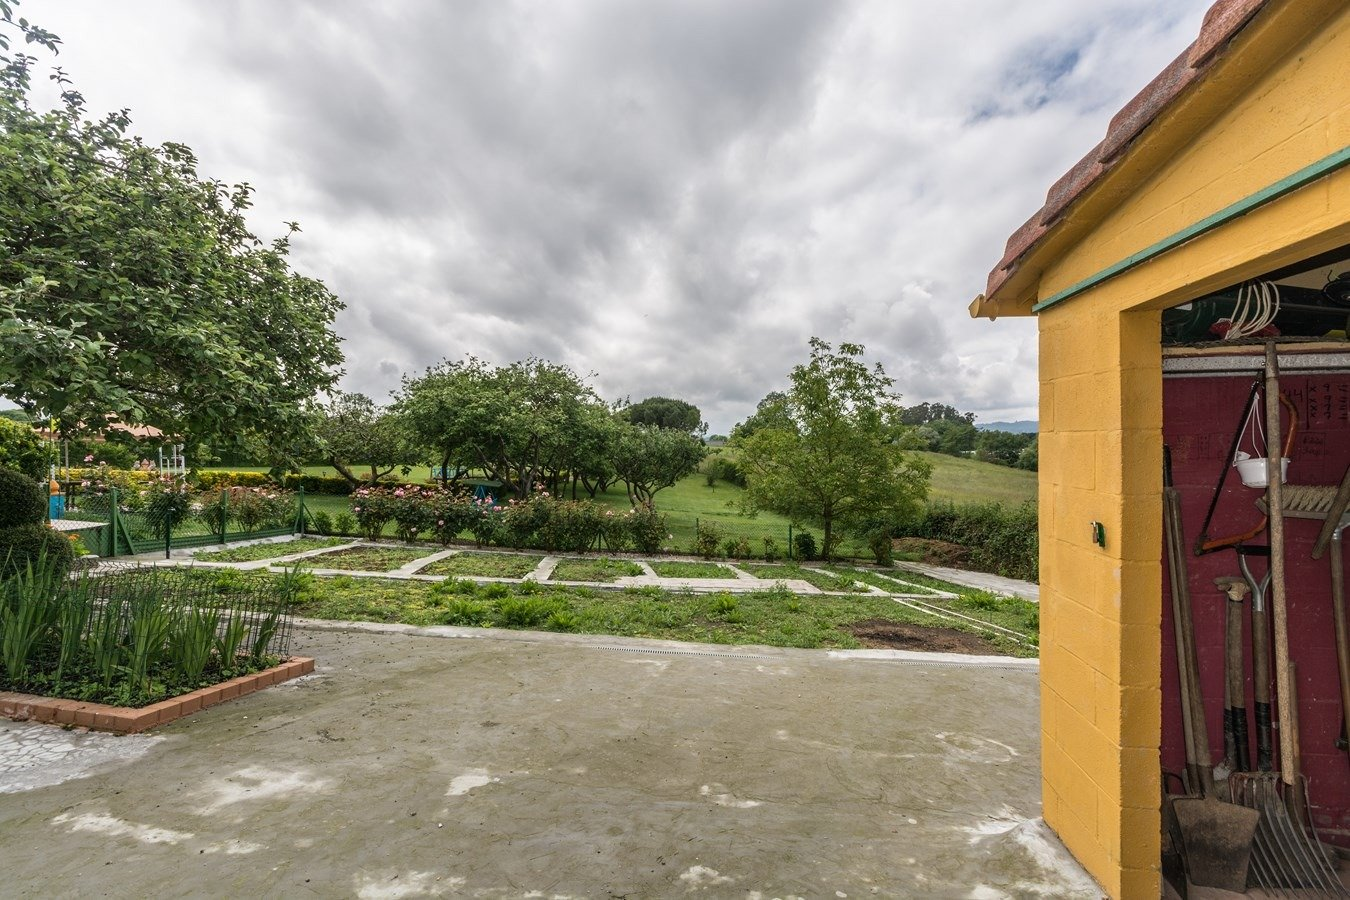 Maravillosa propiedad en orviz. siero - imagenInmueble30